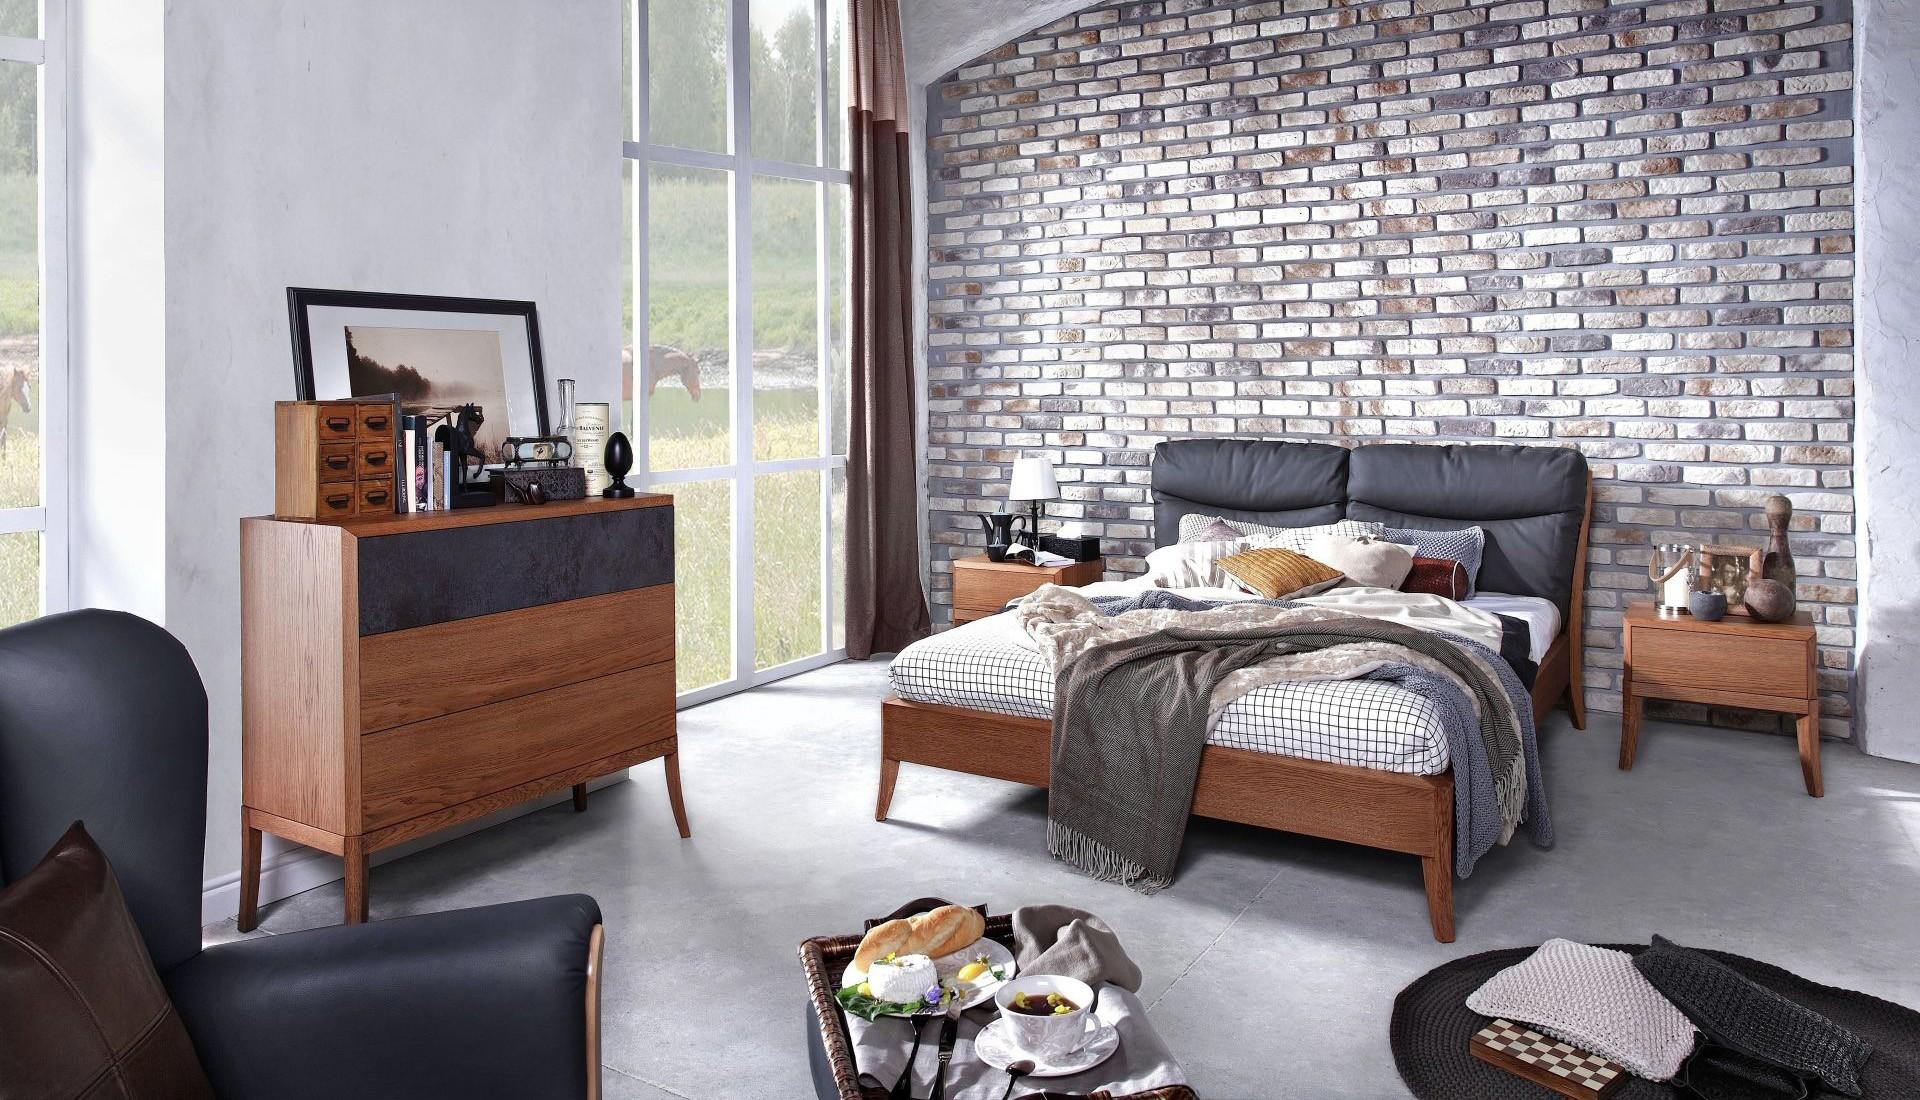 test3 Спальня Dream (Swarzedz Home, Польша) Фото 6